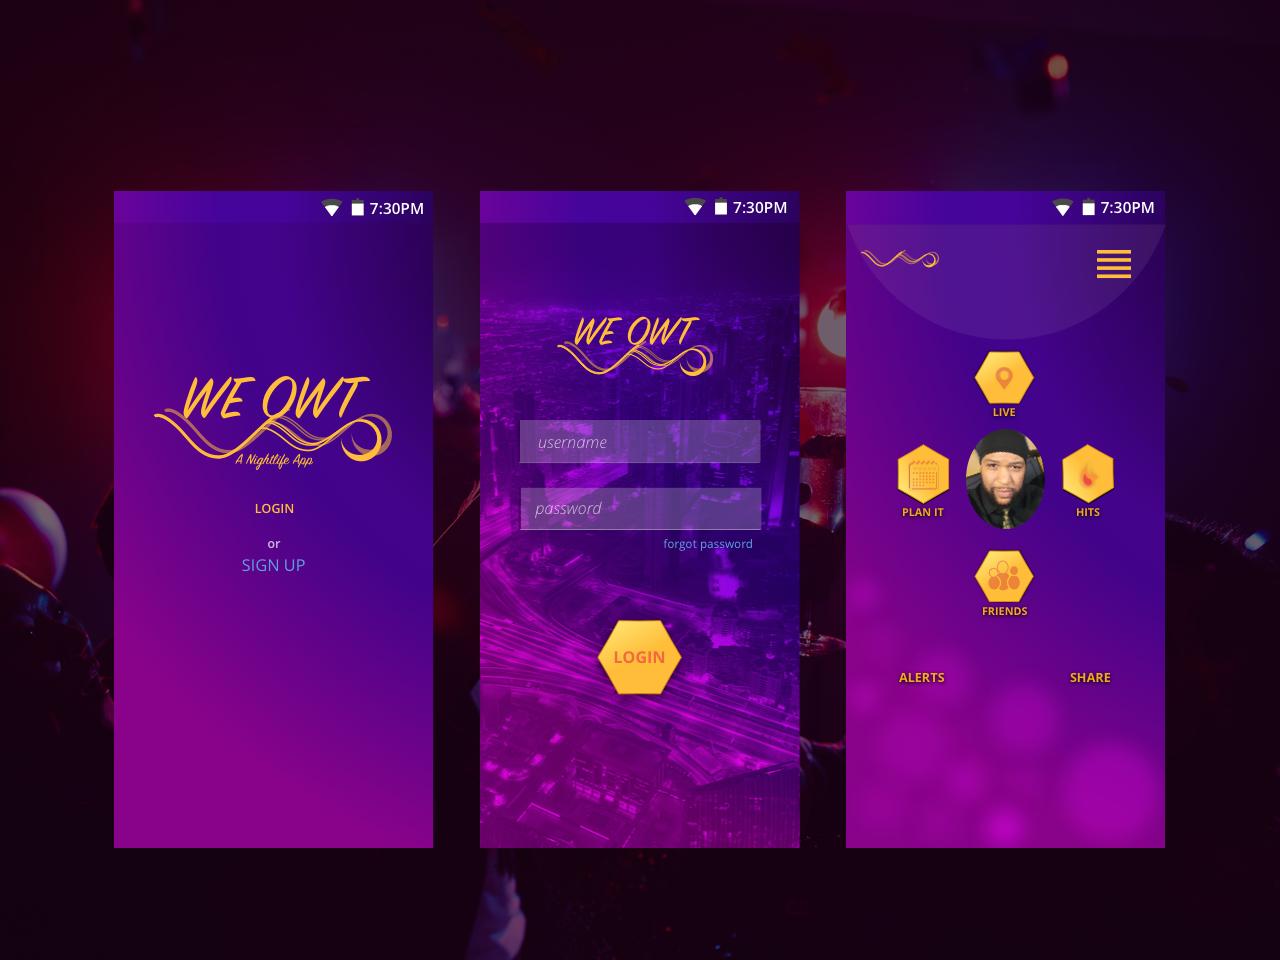 Weowt Nightlife App nightlife user experience userinterface appui appdesigner appdesign app branding uidesigner uidesign logodesign logo landingpage webdesigner webdesign ux ui